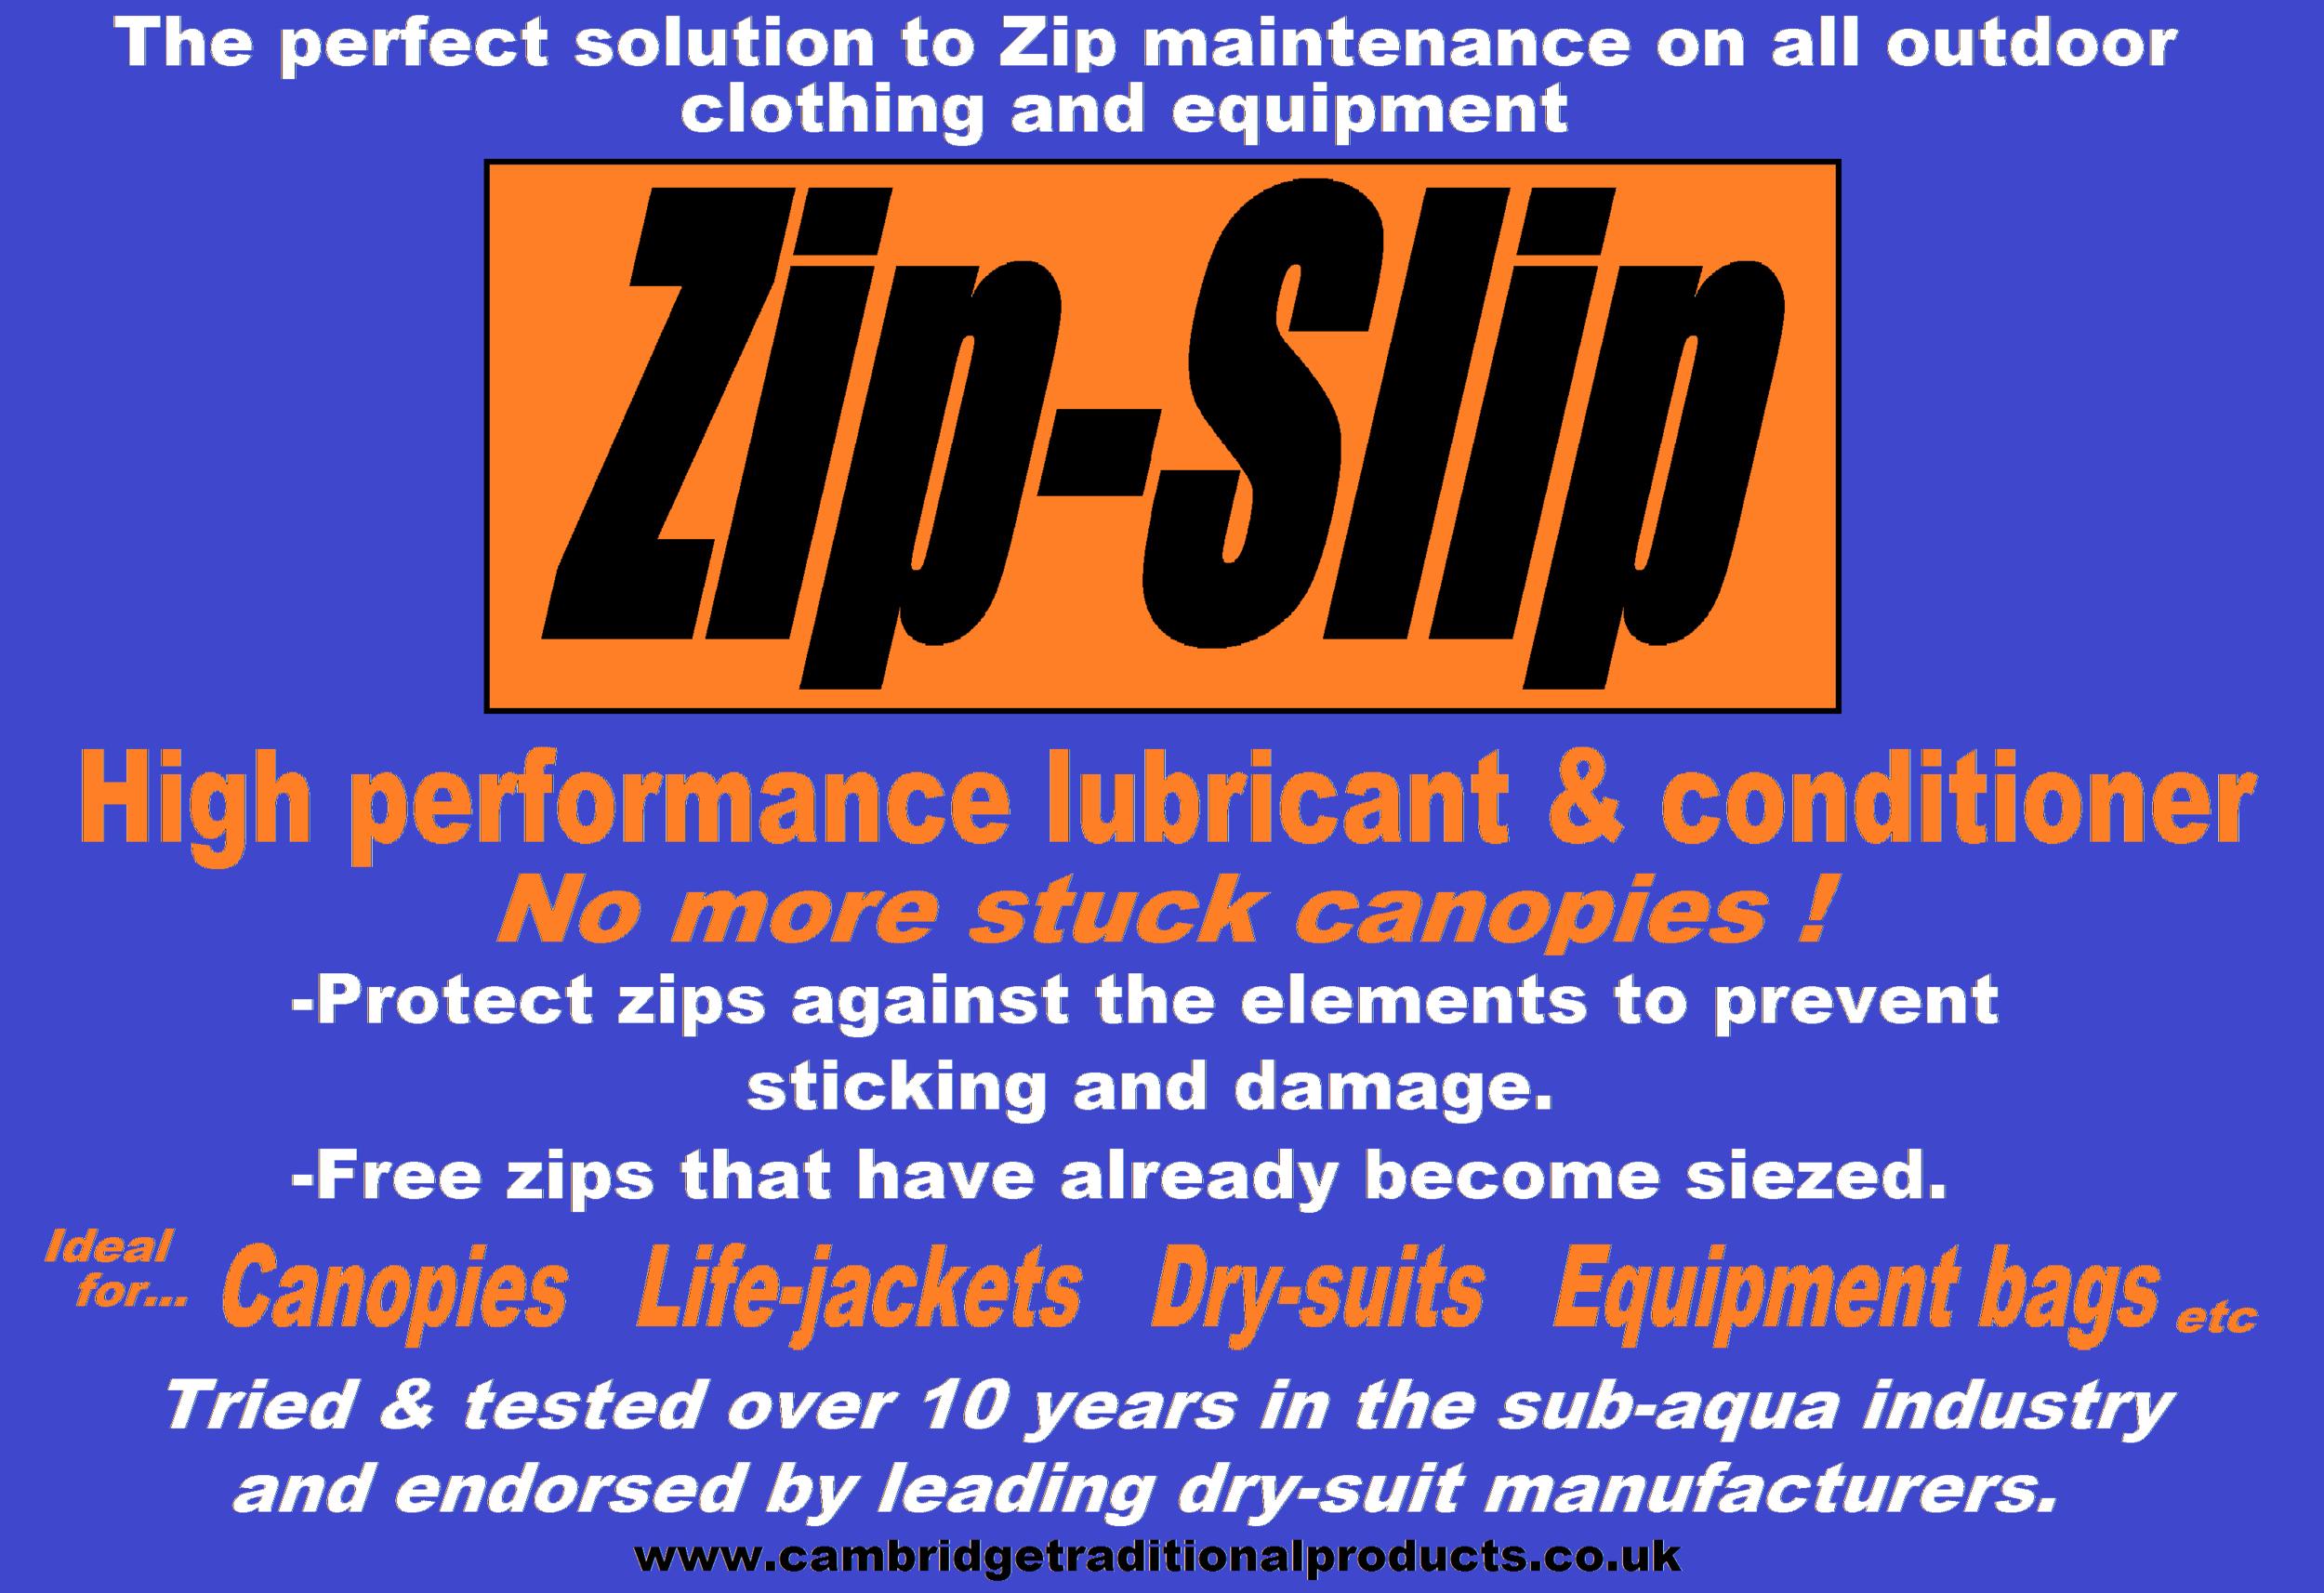 Zip-Slip - zip lubricant and zip repair for outdoor clothing and equipment